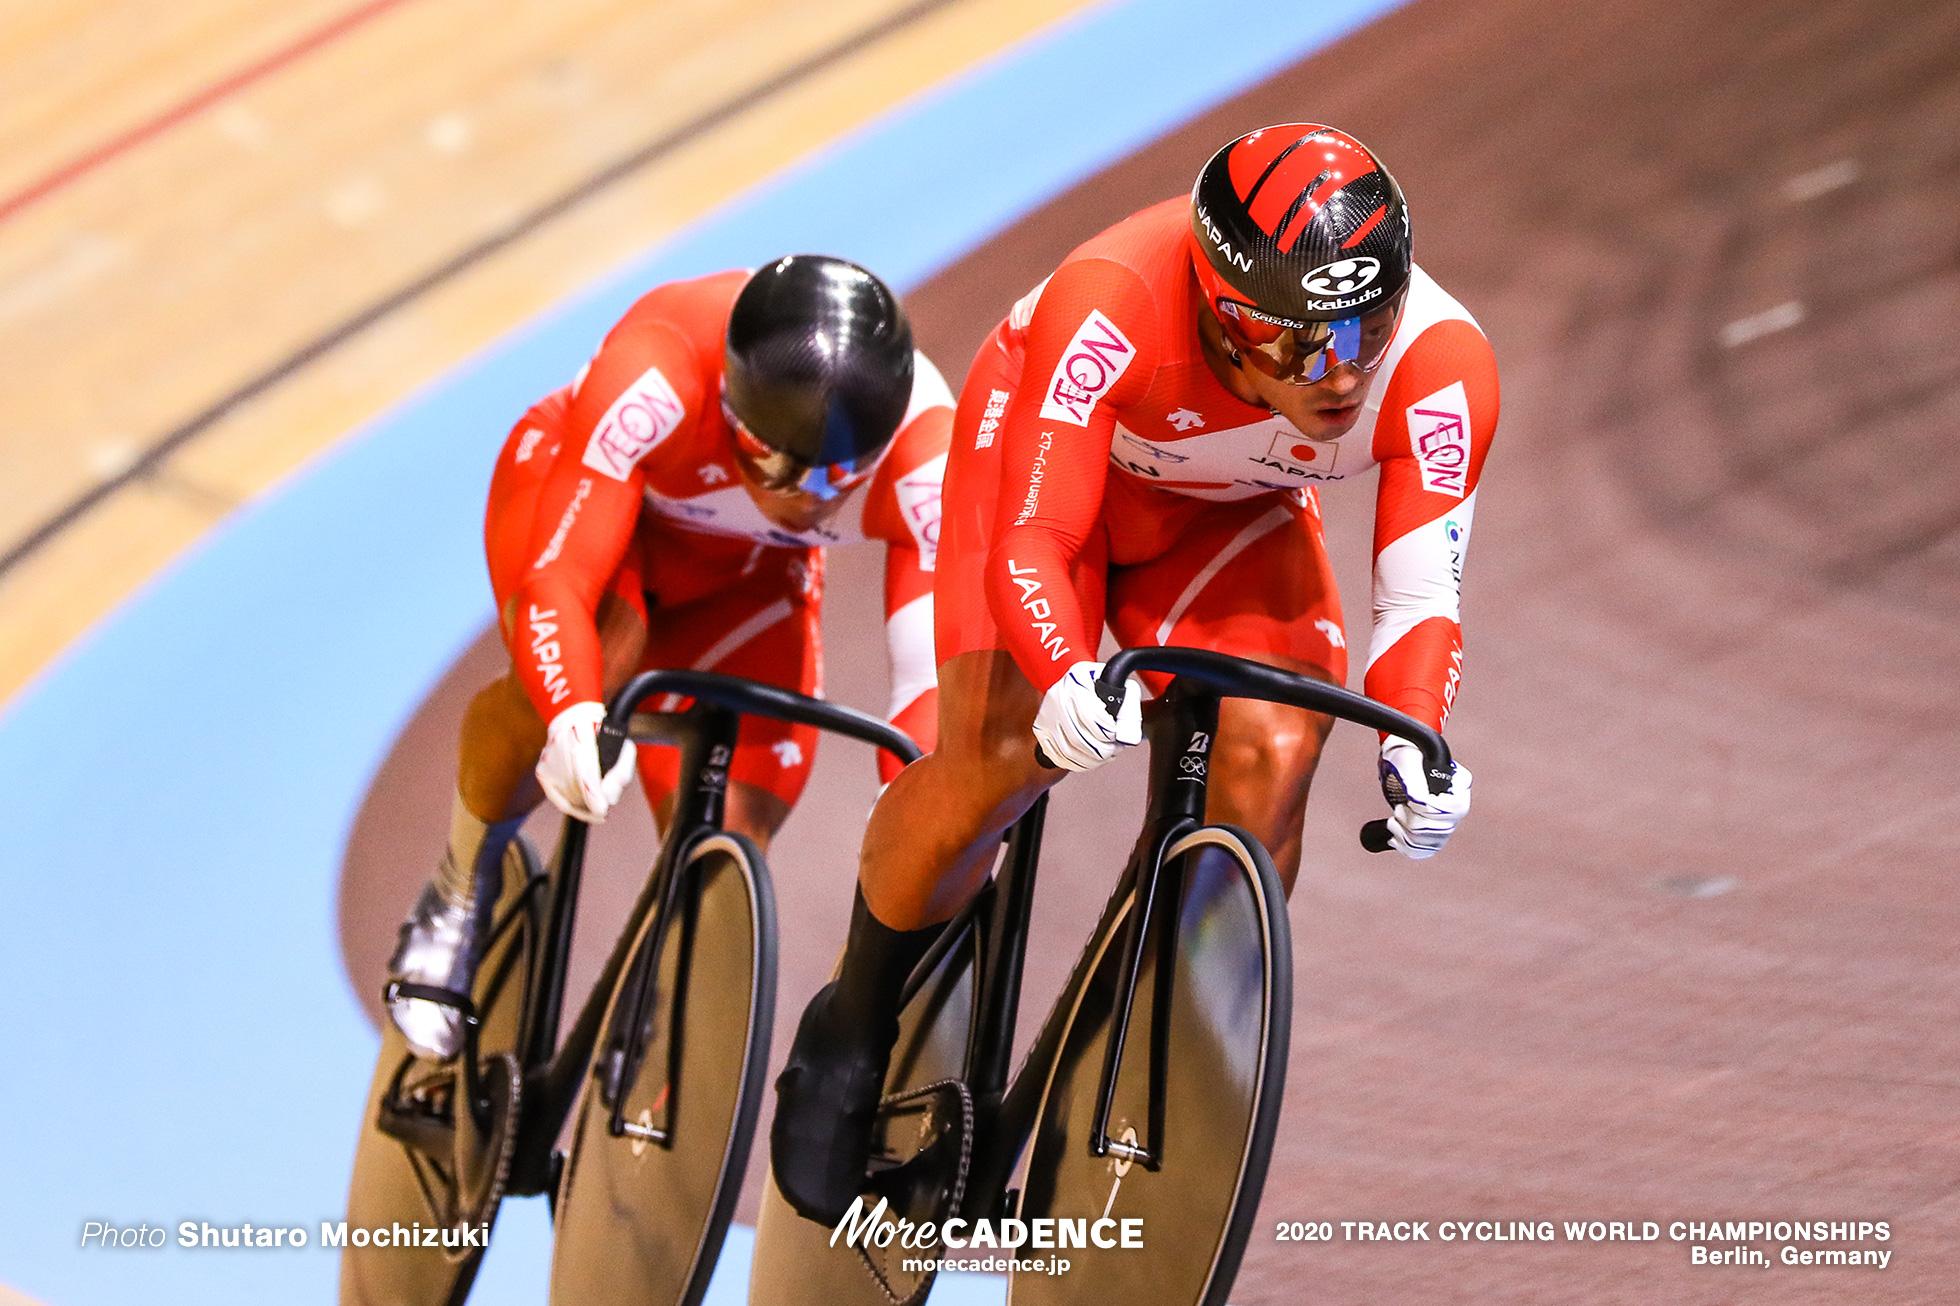 Qualifying / Men's Team Sprint / 2020 Track Cycling World Championships, 新田祐大 Nitta Yudai, 深谷知広 Fukaya Tomohiro